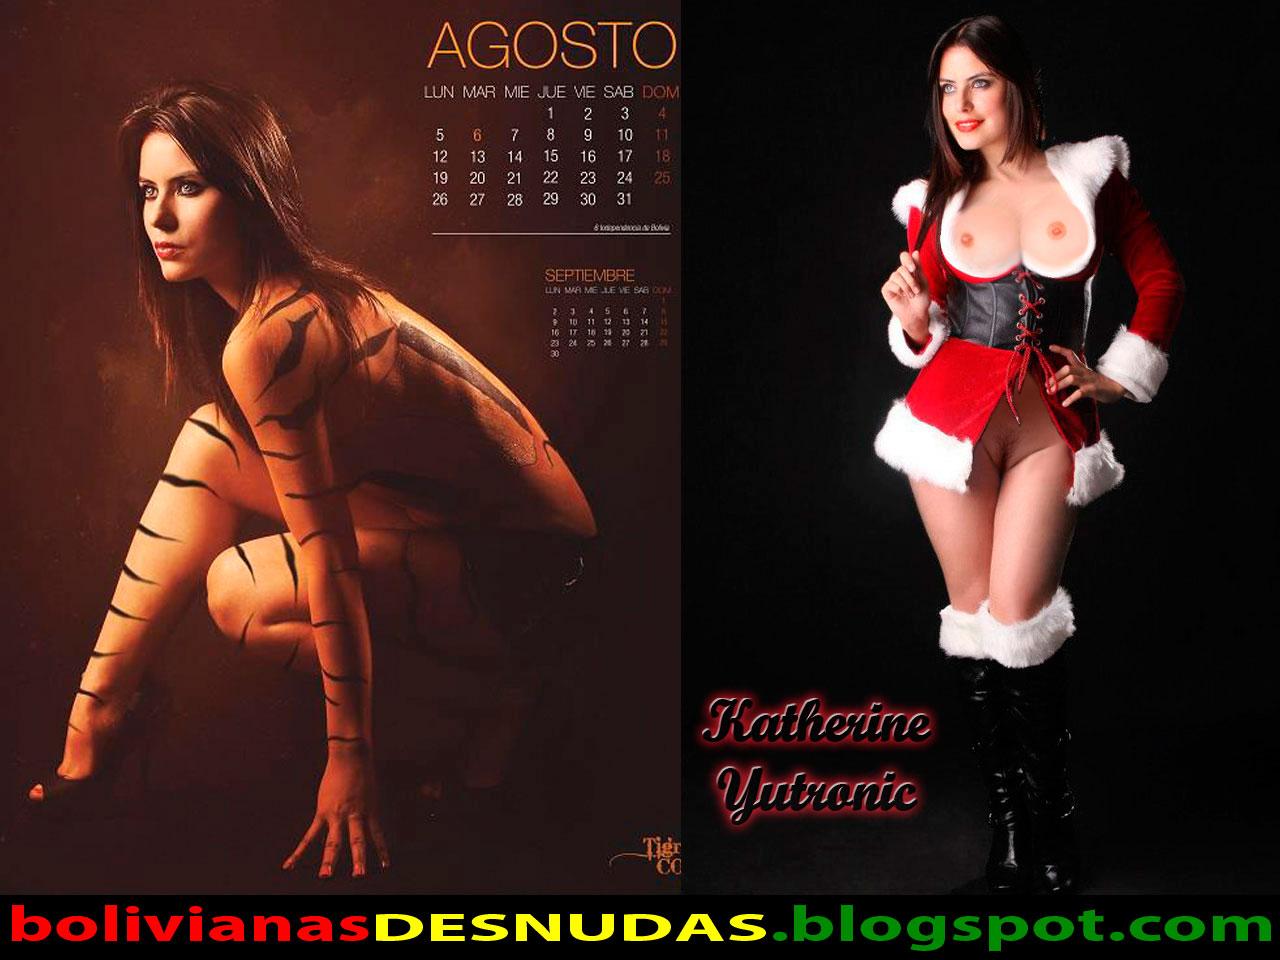 Bolivianas Famosas Desnudas Paola Belmonte Desnuda Filmvz Portal